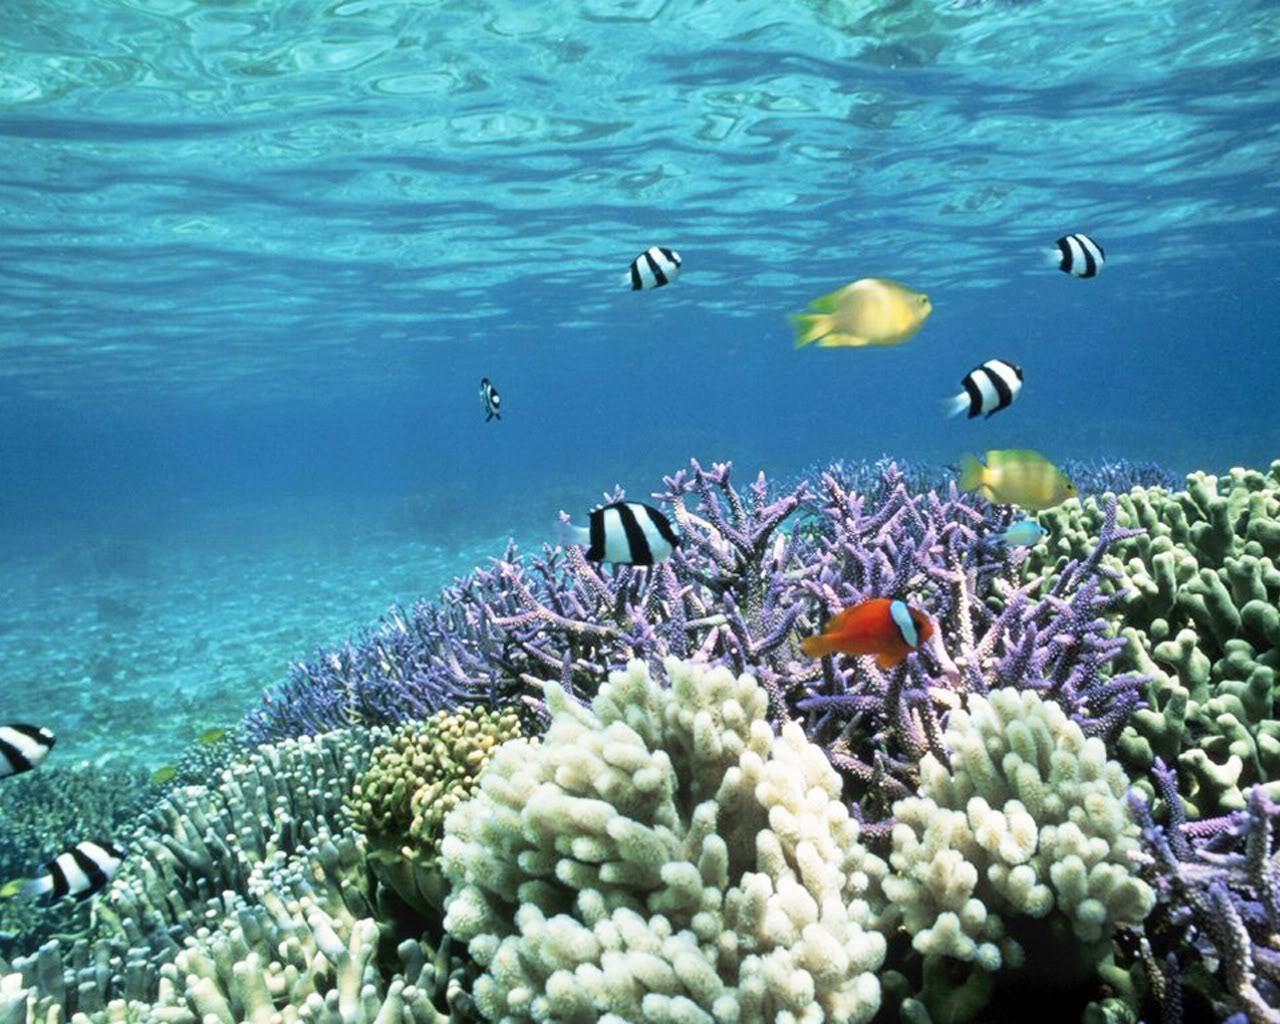 Underwater Tropical Fish underwater tropical fish